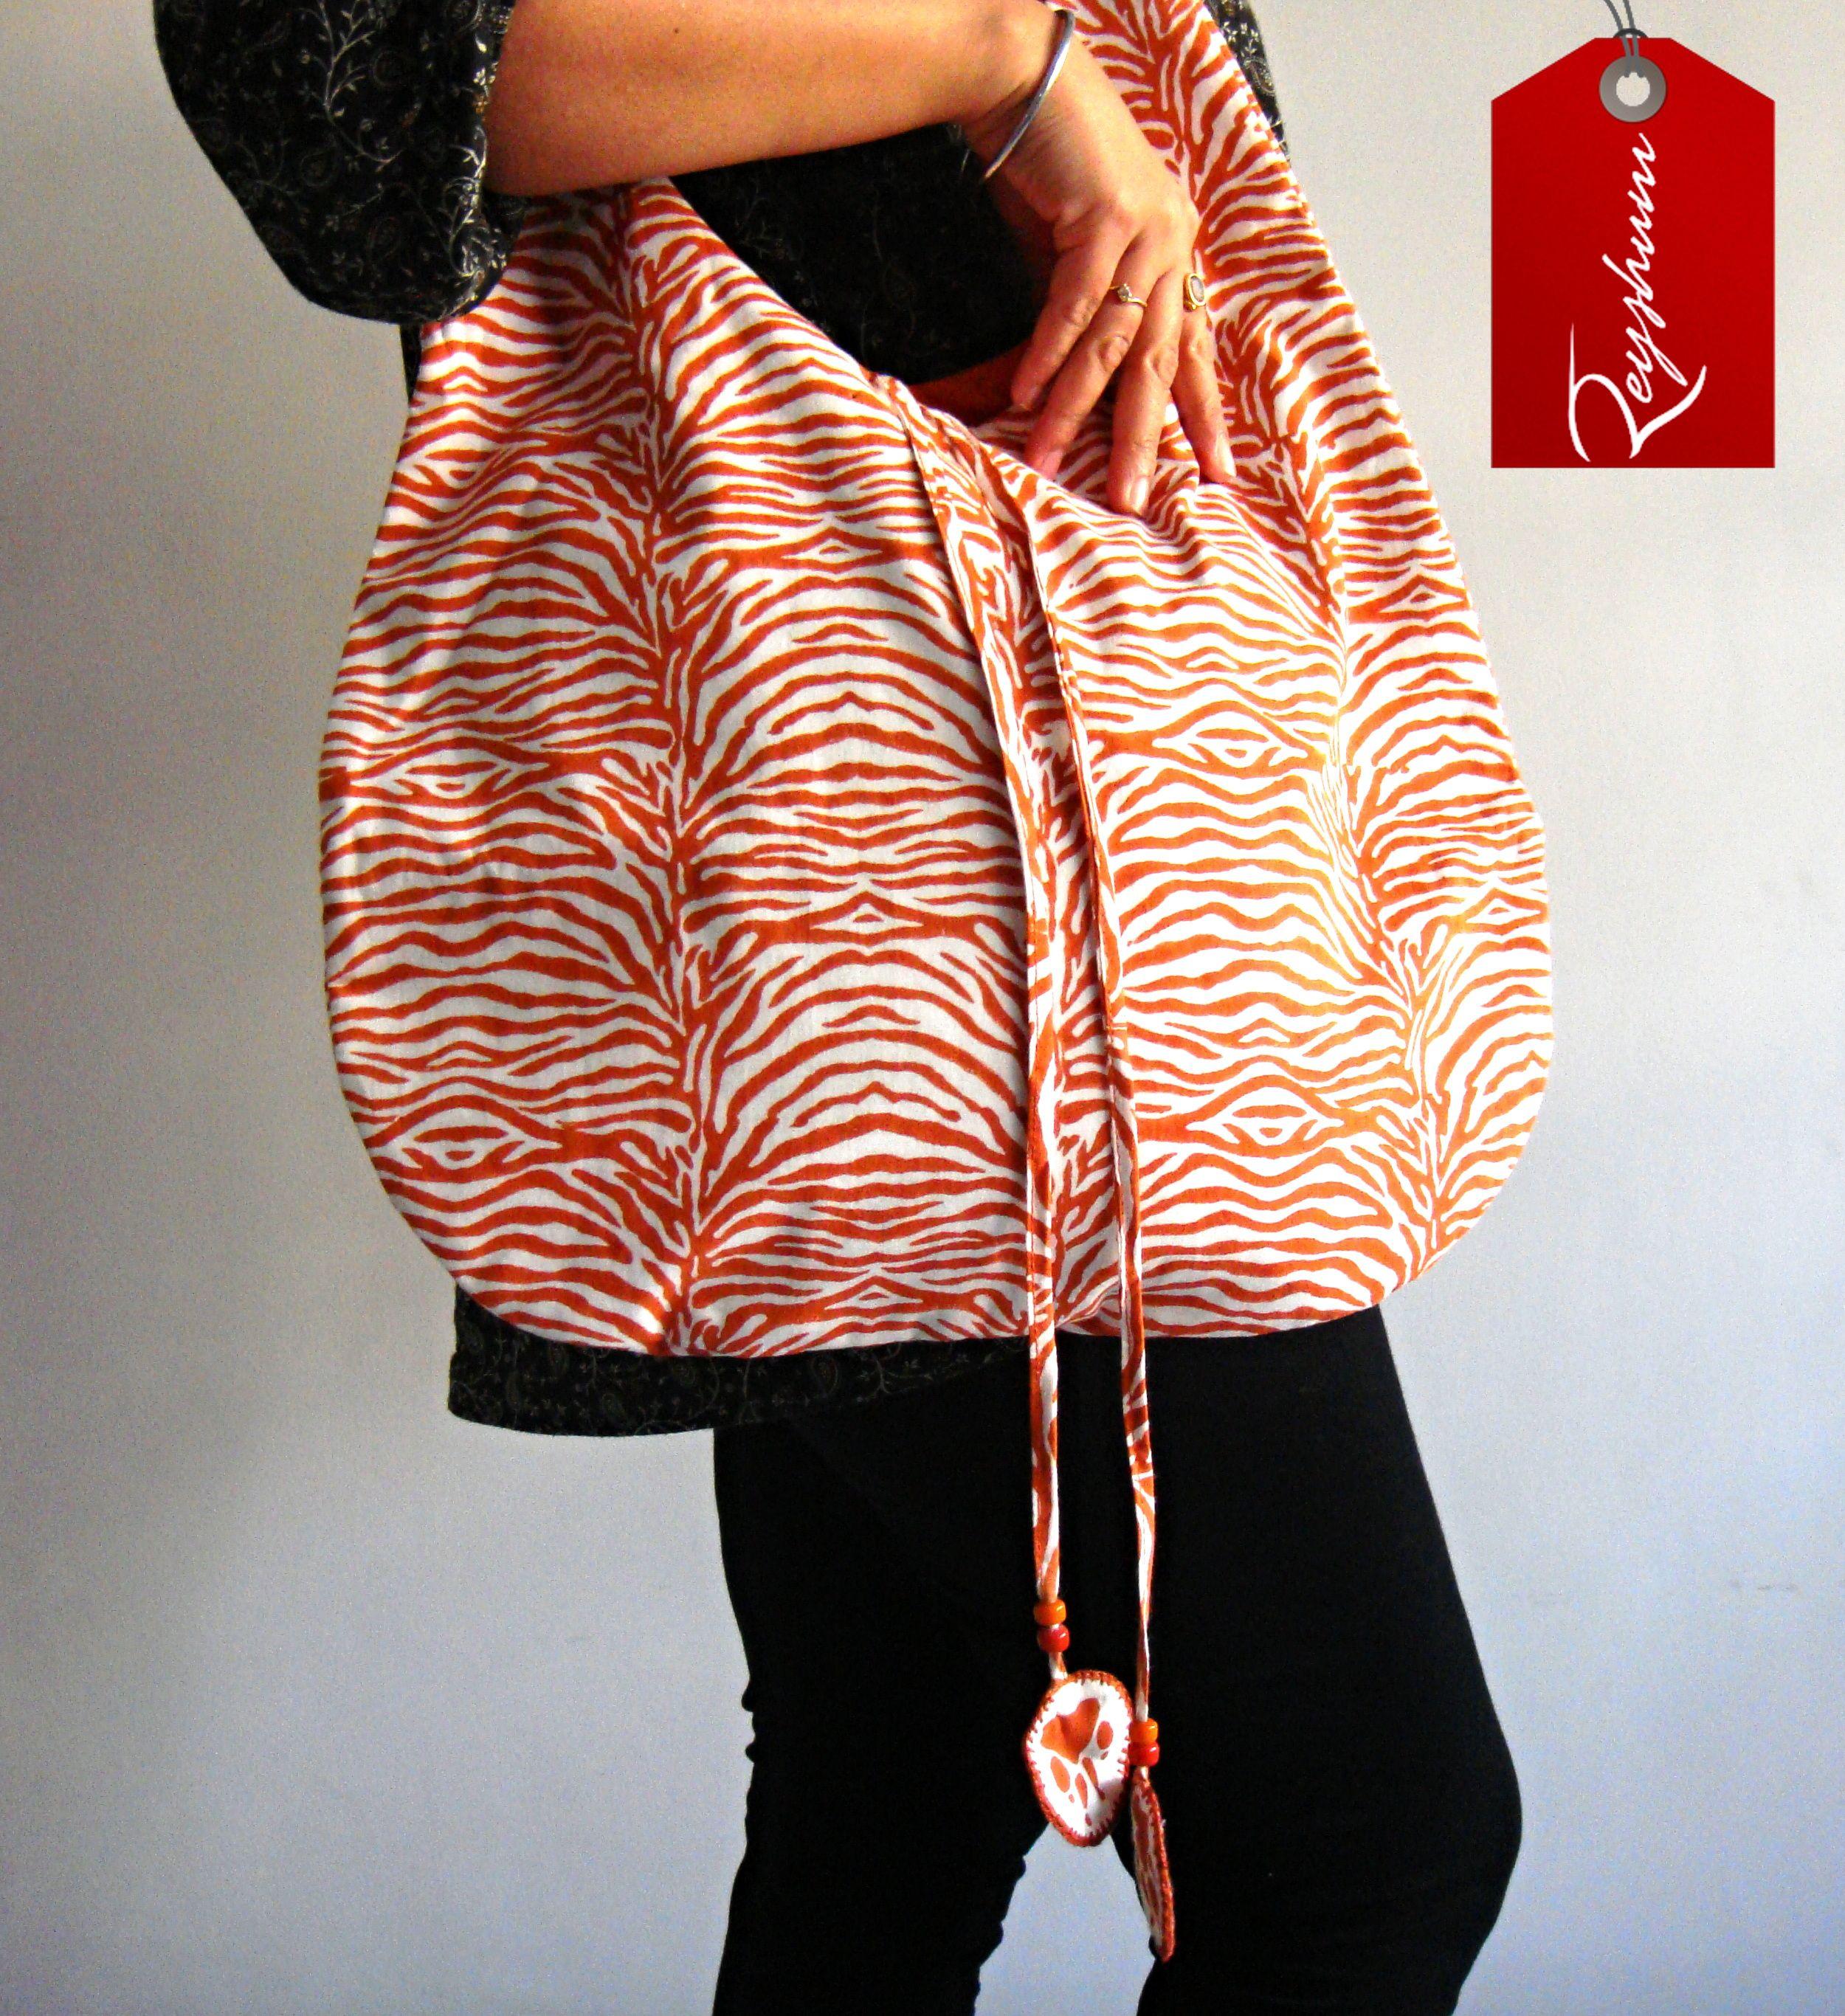 Hobo Bag - Block Print Hobo Bag -Shoulder Bag - #Cotton Bag - #Tote Bag - #Beach Bag #Etsy store etsy.me/1yvtT9D